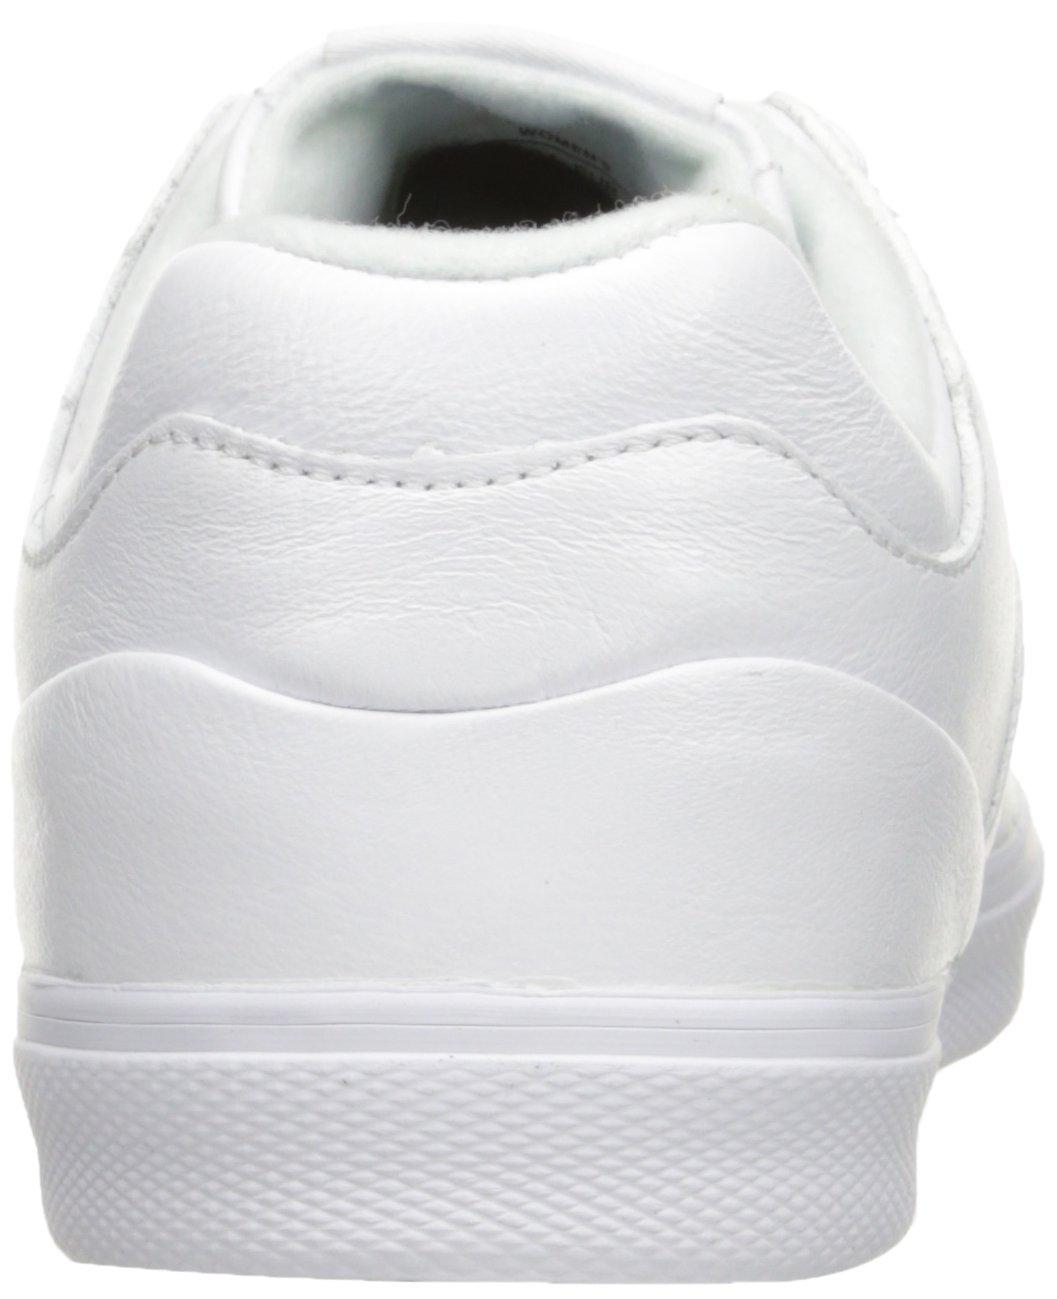 K-Swiss Women's Gstaad Neu Sleek Fashion Sneaker B01LX0JC2X 7 B(M) US|White/White Iridescent